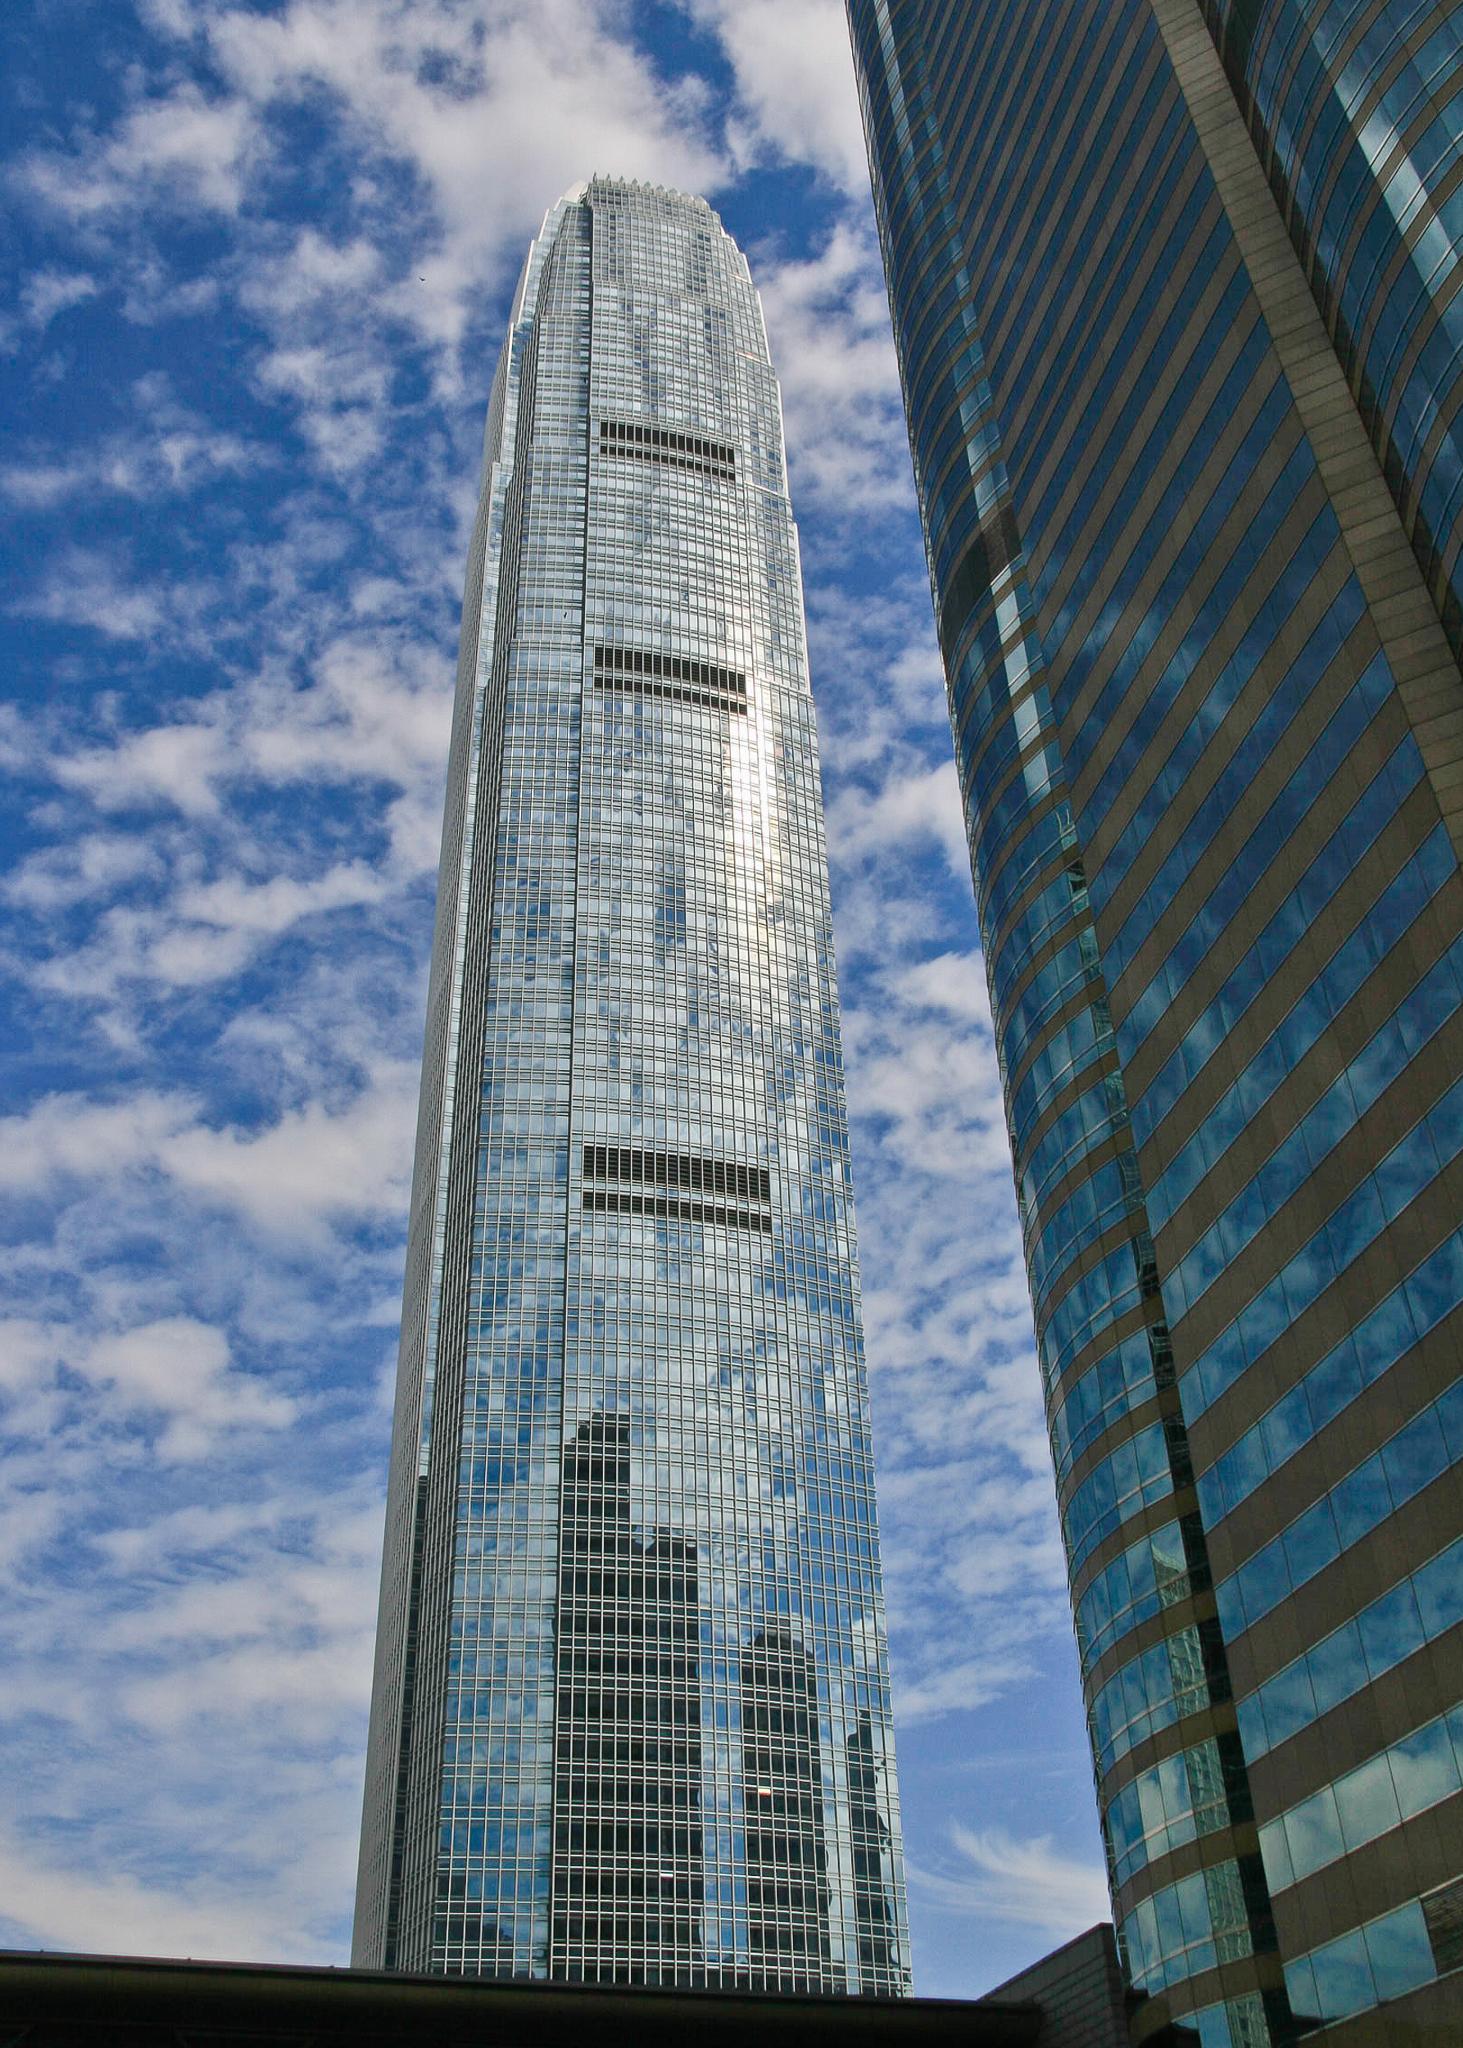 IFC Hong Kong by stephenhops